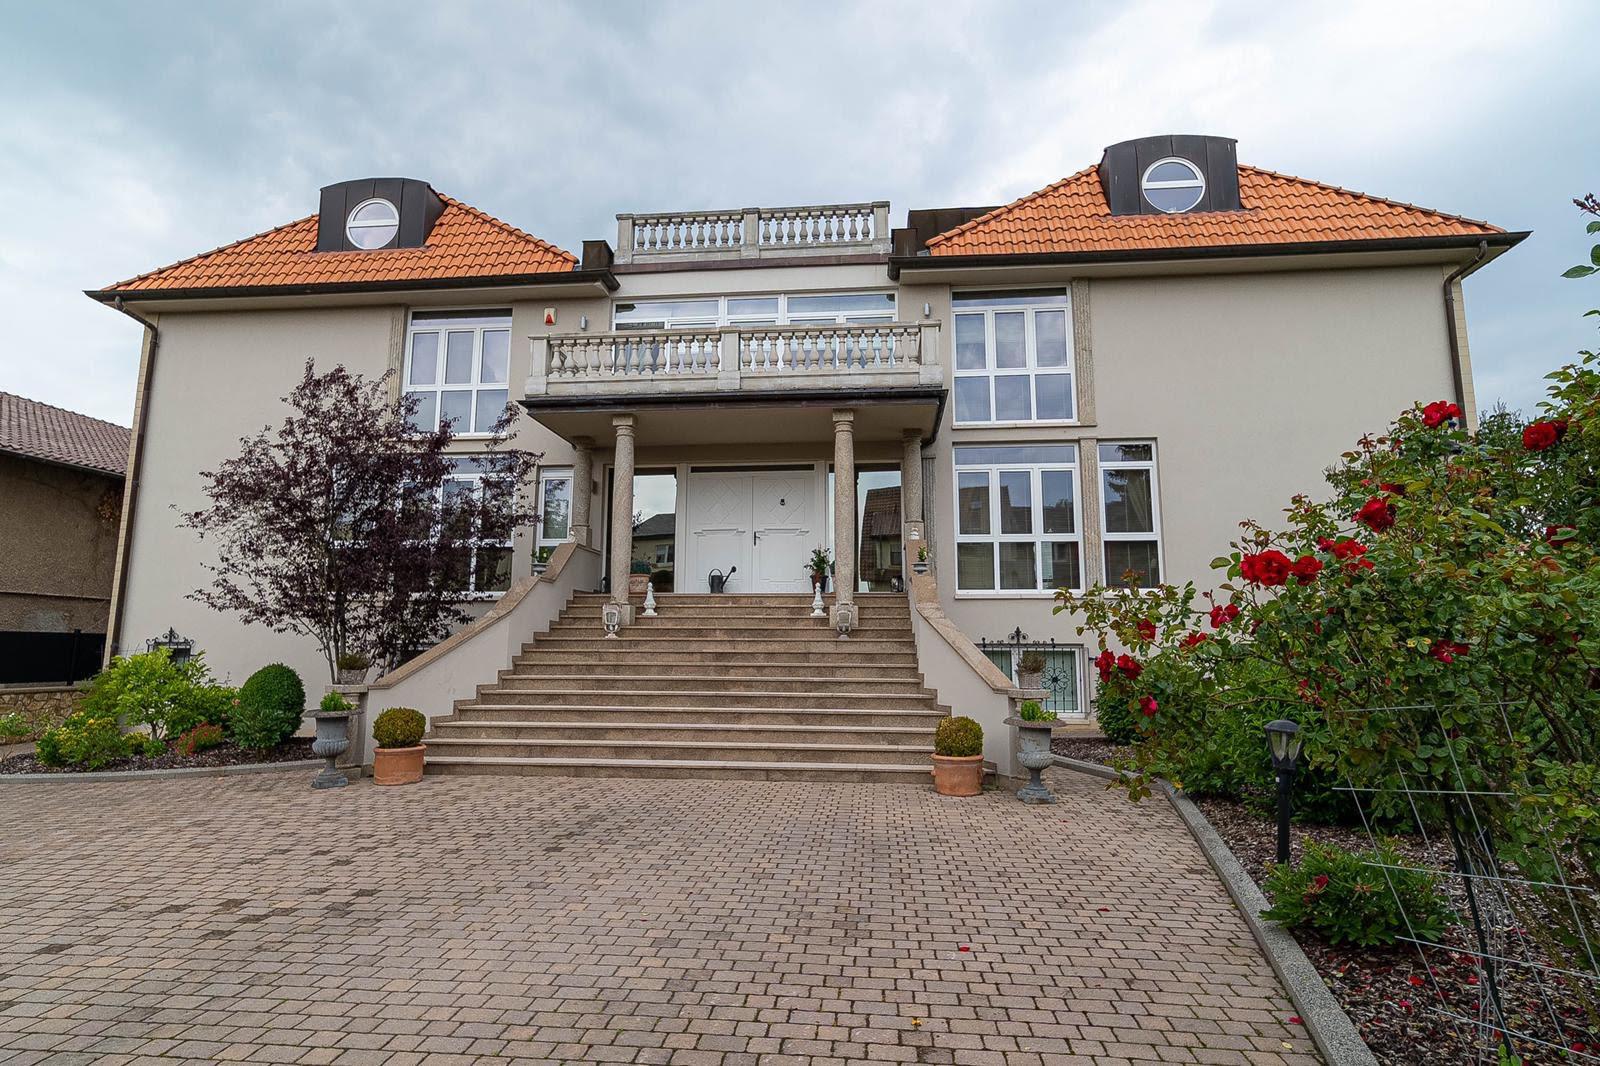 Продажа Вилла - Mondercange - Люксембург